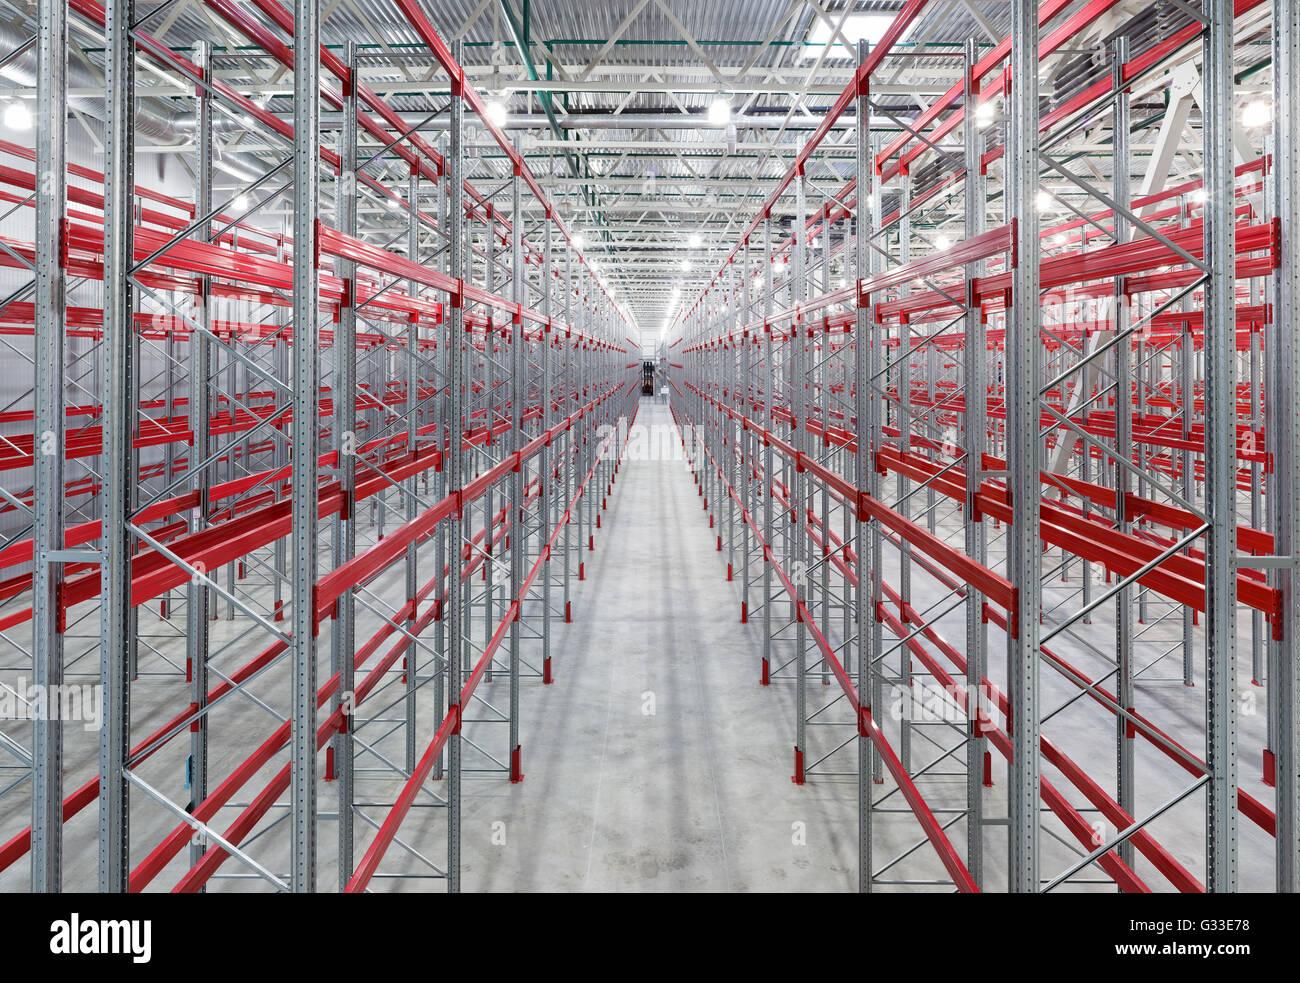 Industrial racks pallets shelves in huge empty warehouse interior. Storage equipment. - Stock Image